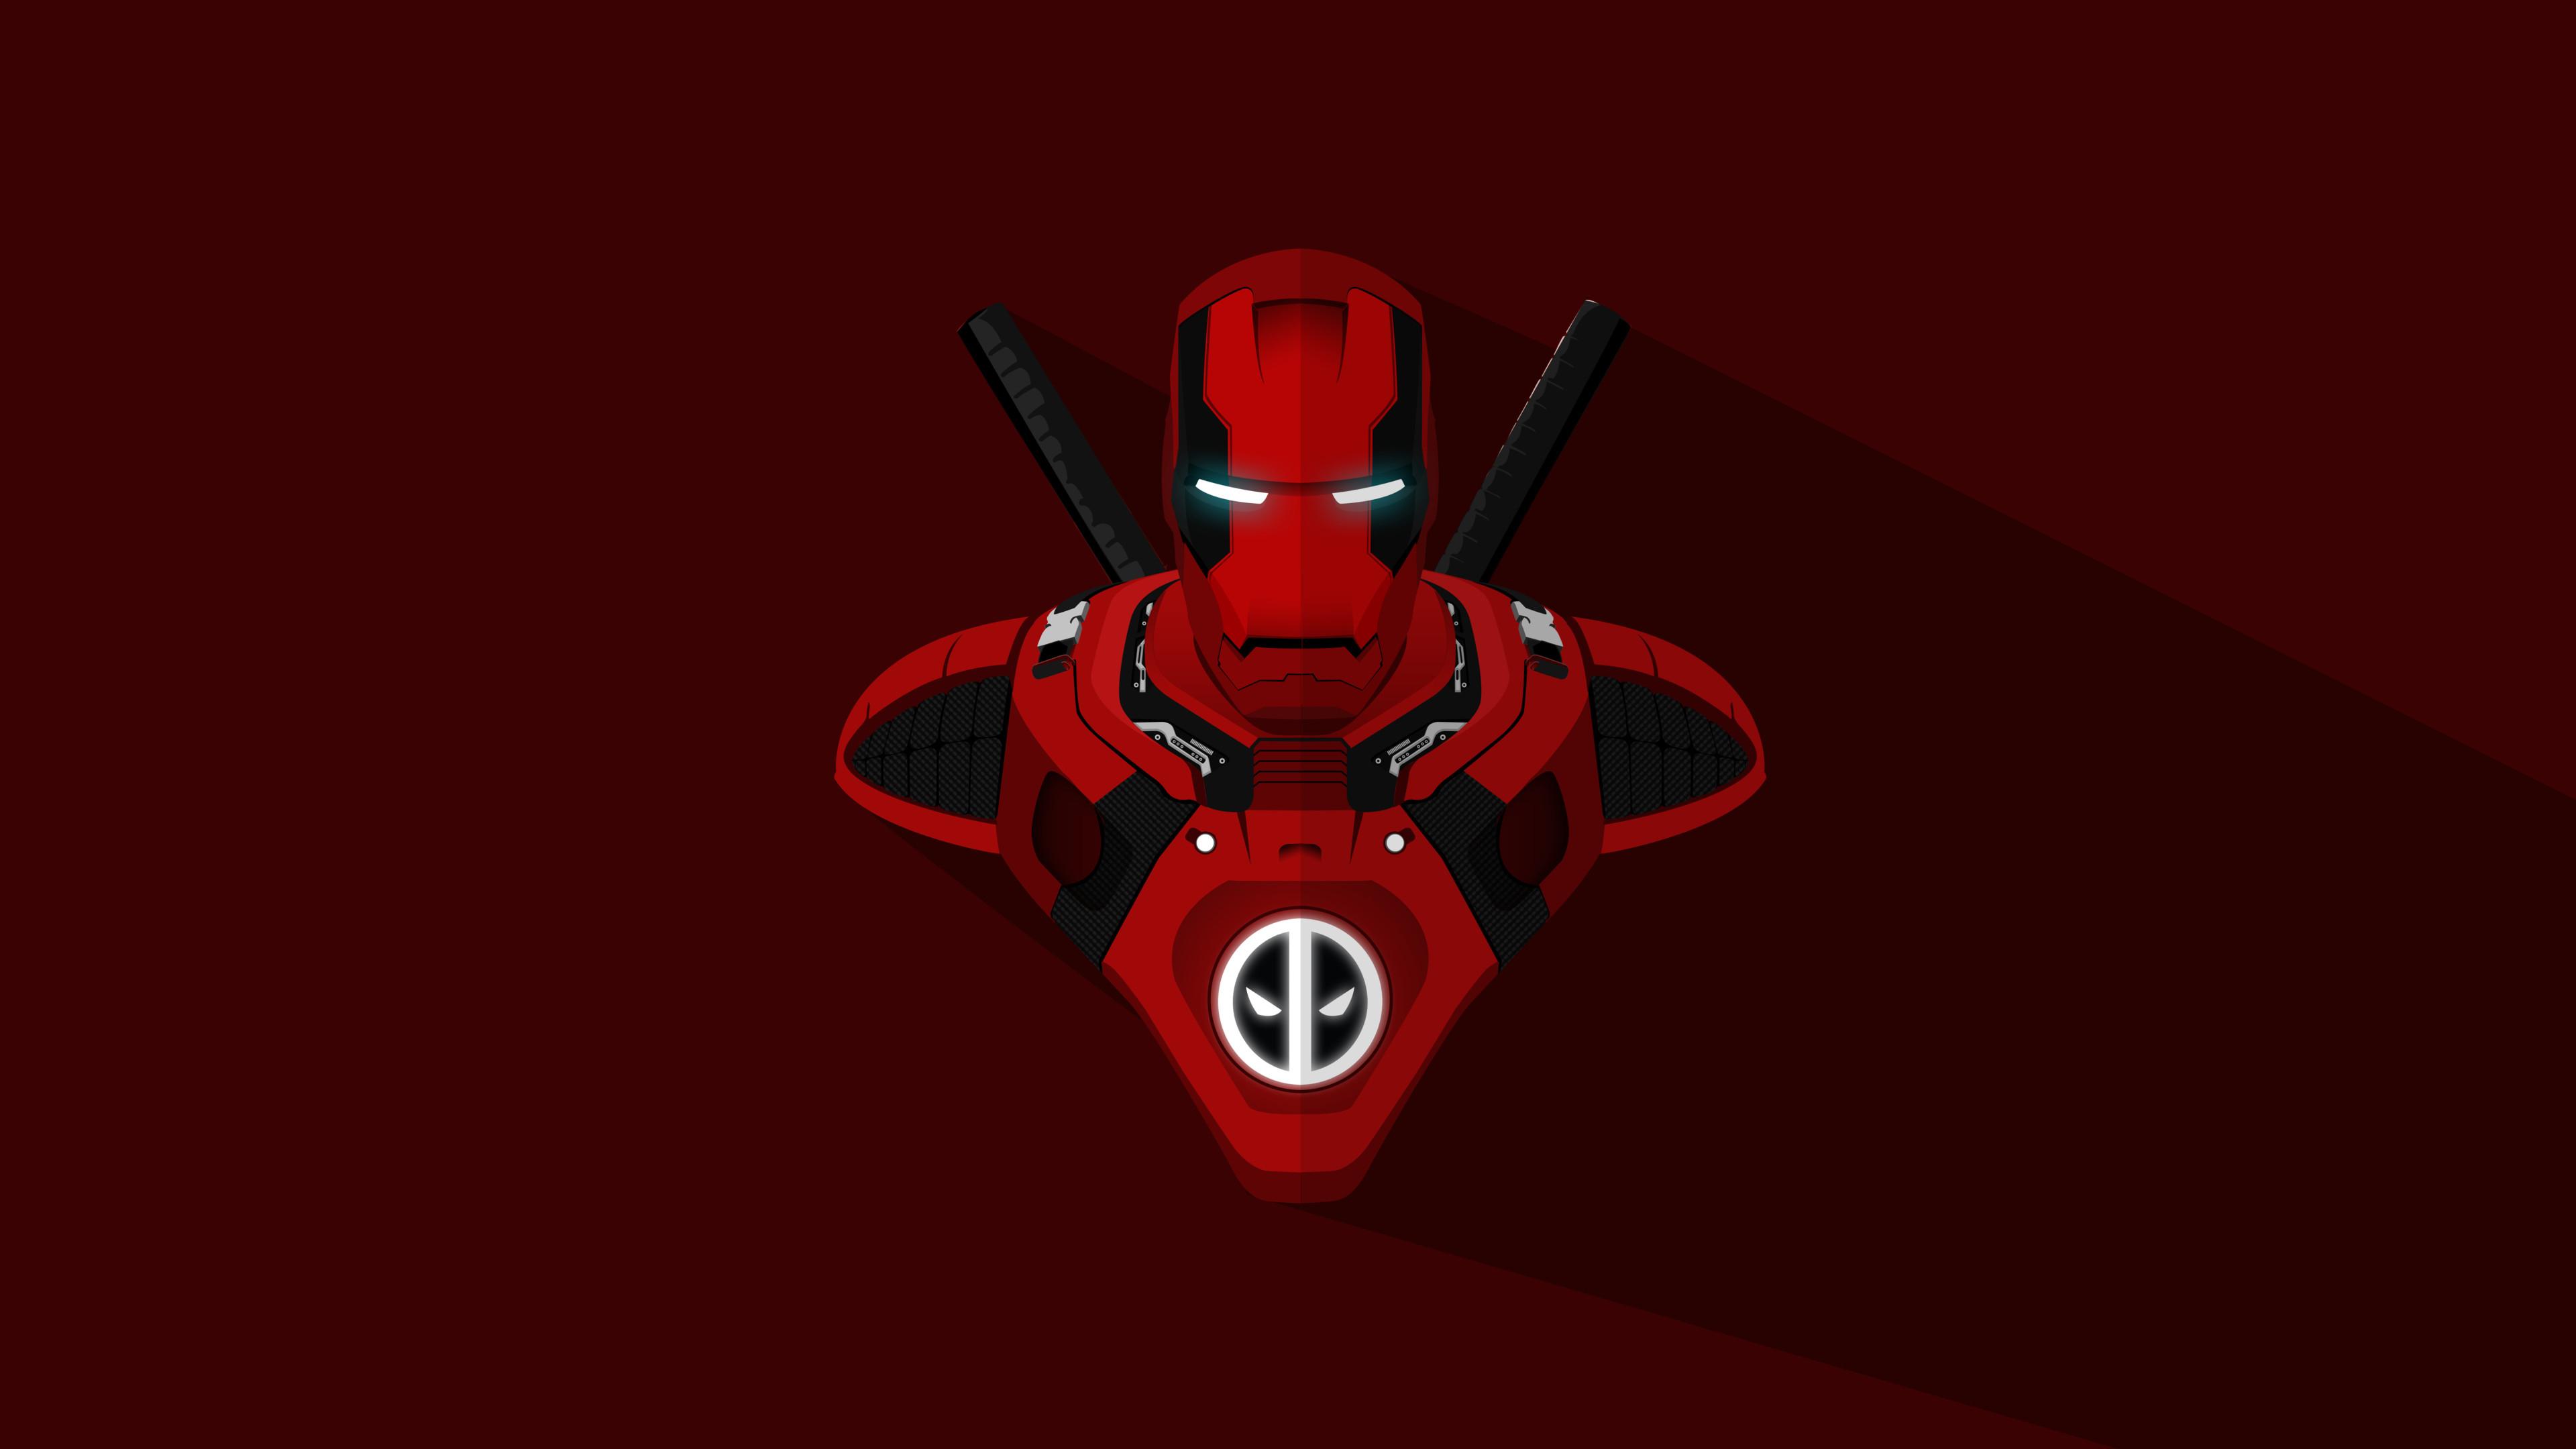 Madara Wallpaper 3d Hd Iron Man Deadpool Crossover 4k Wallpapers Hd Wallpapers